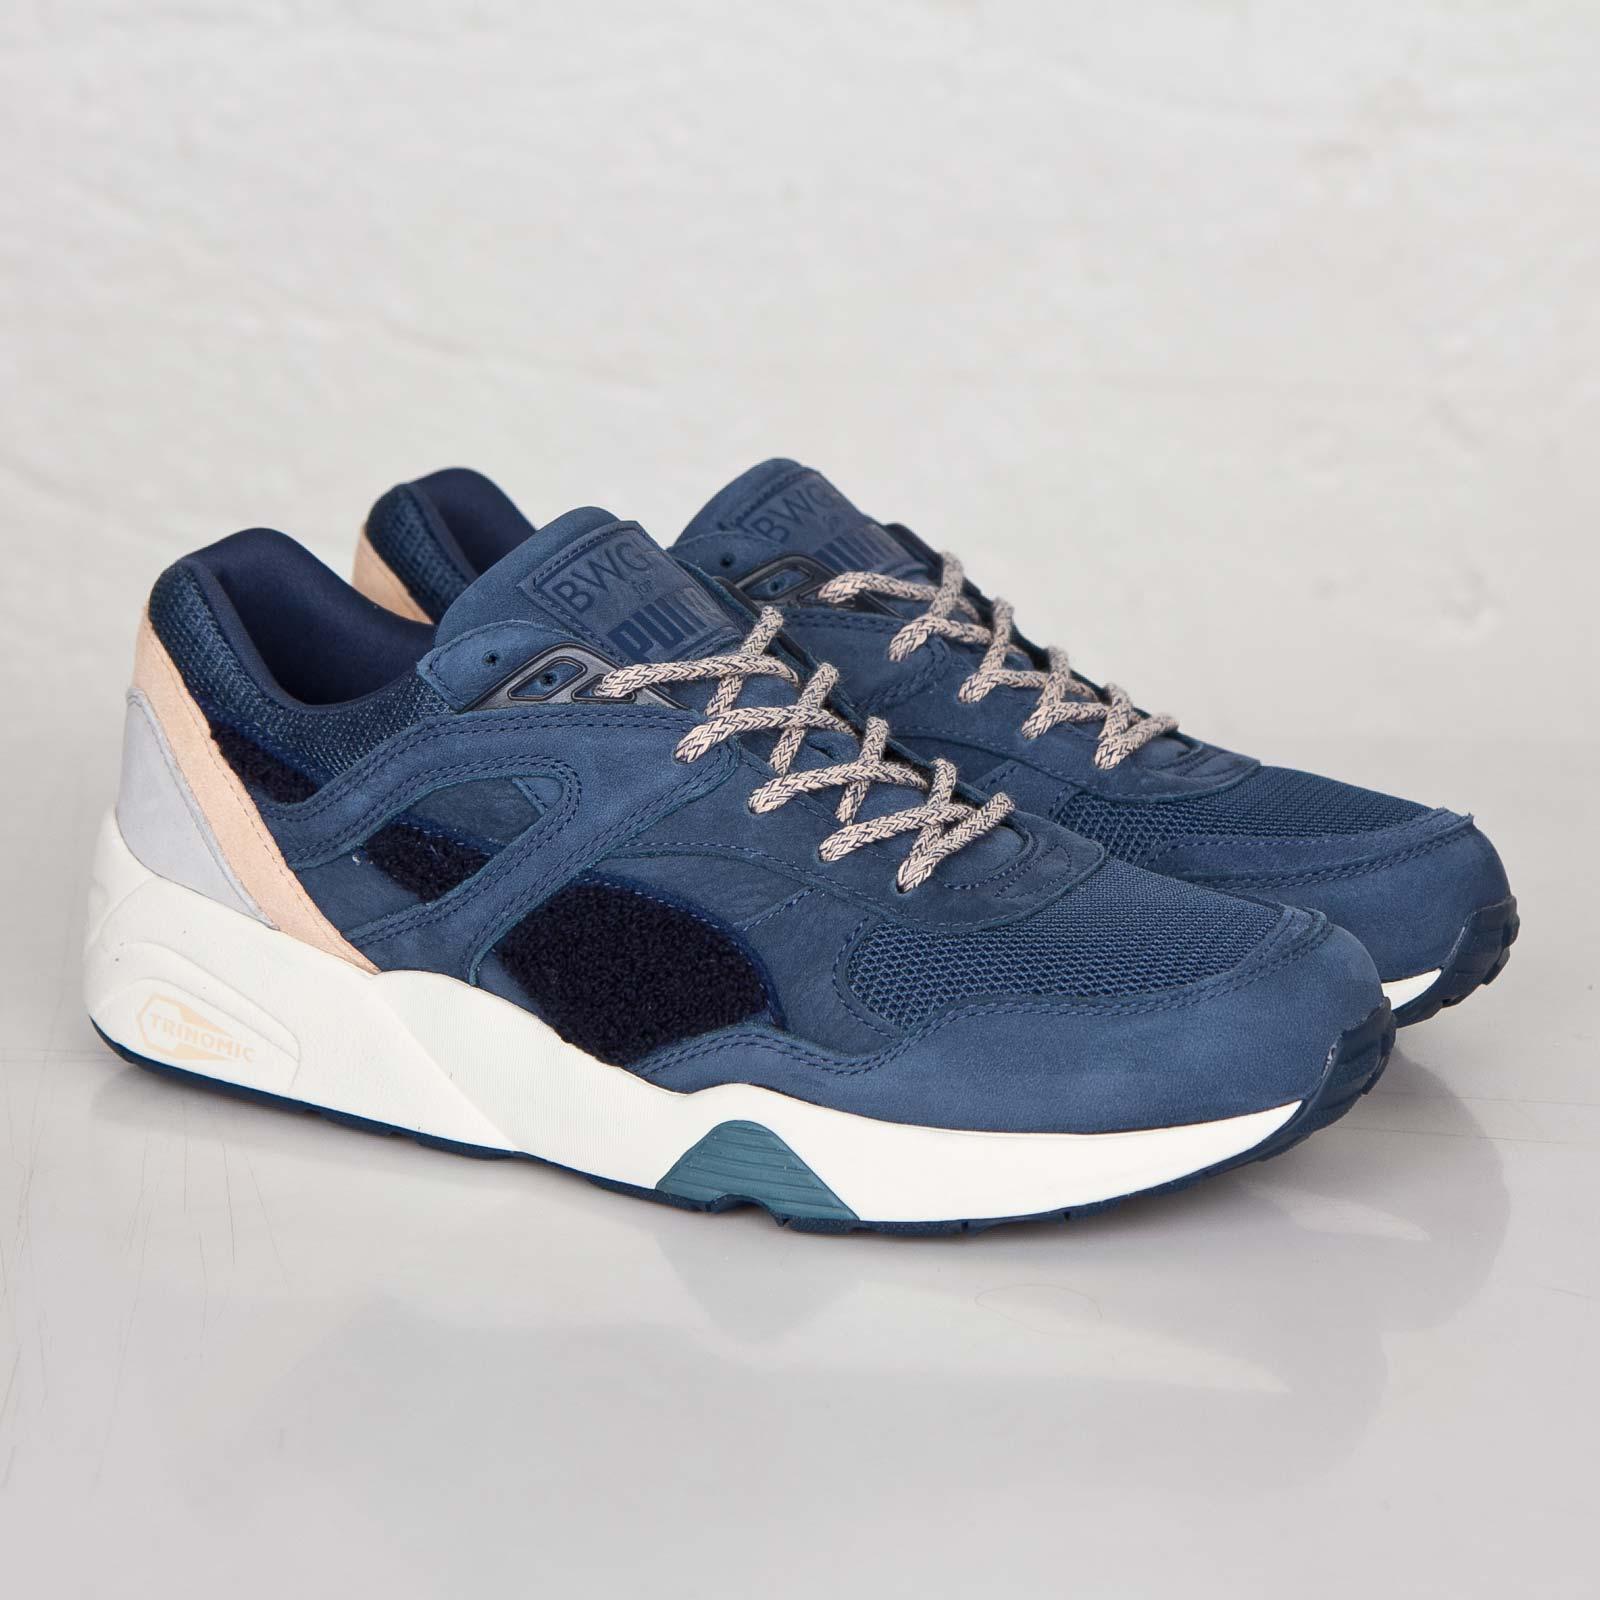 Puma R698 x BWGH - 357769-01 - Sneakersnstuff  debaa521e